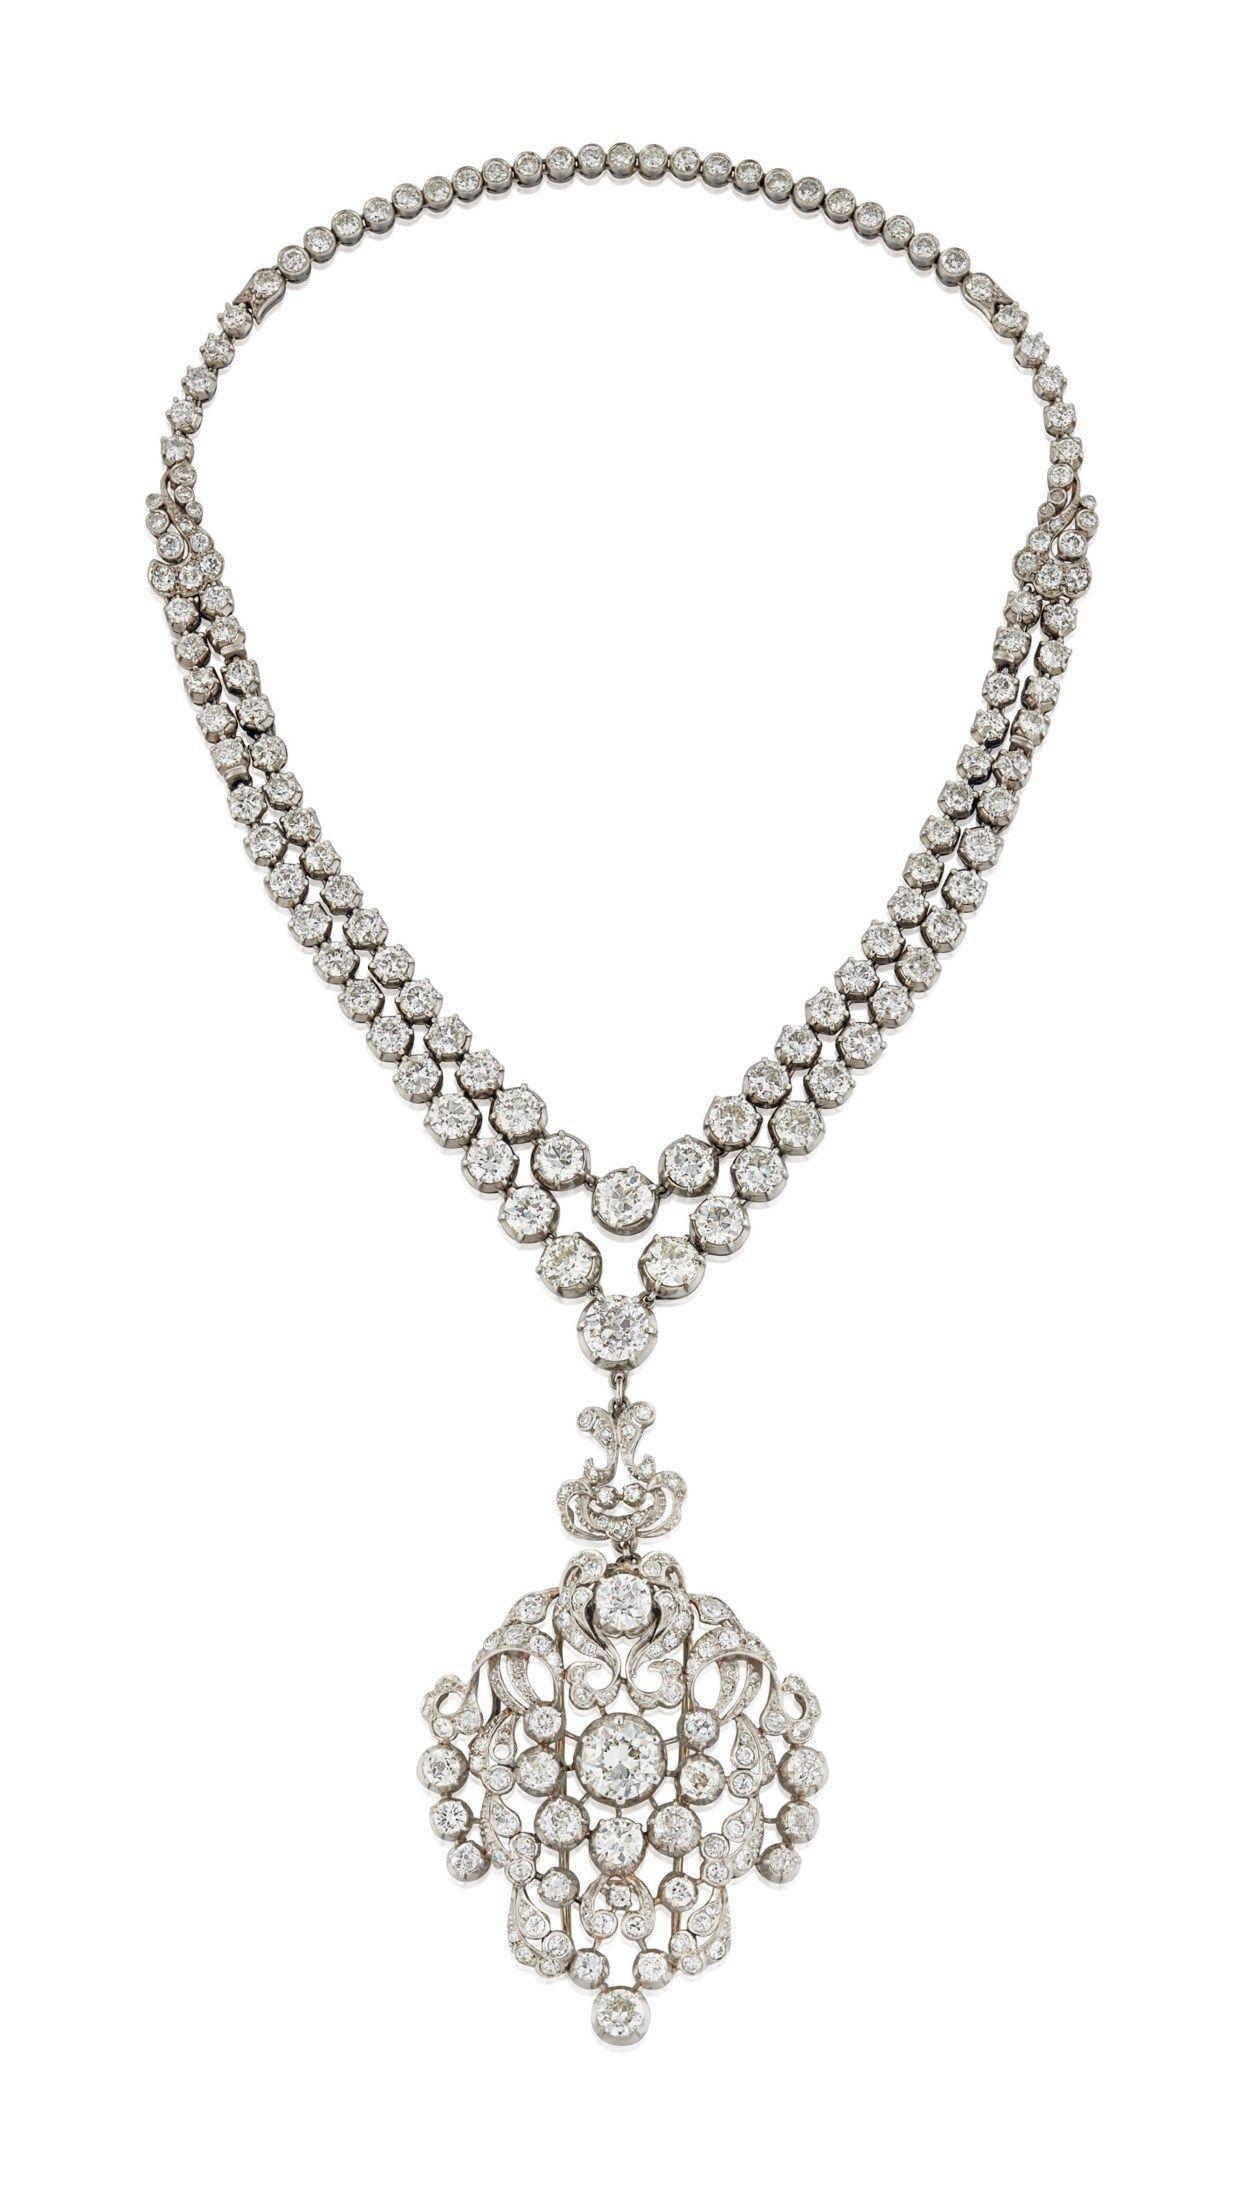 Diamond Pendant Necklace Necklace Diamond Christie S Diamond Pendant Diamond Royal Jewelry